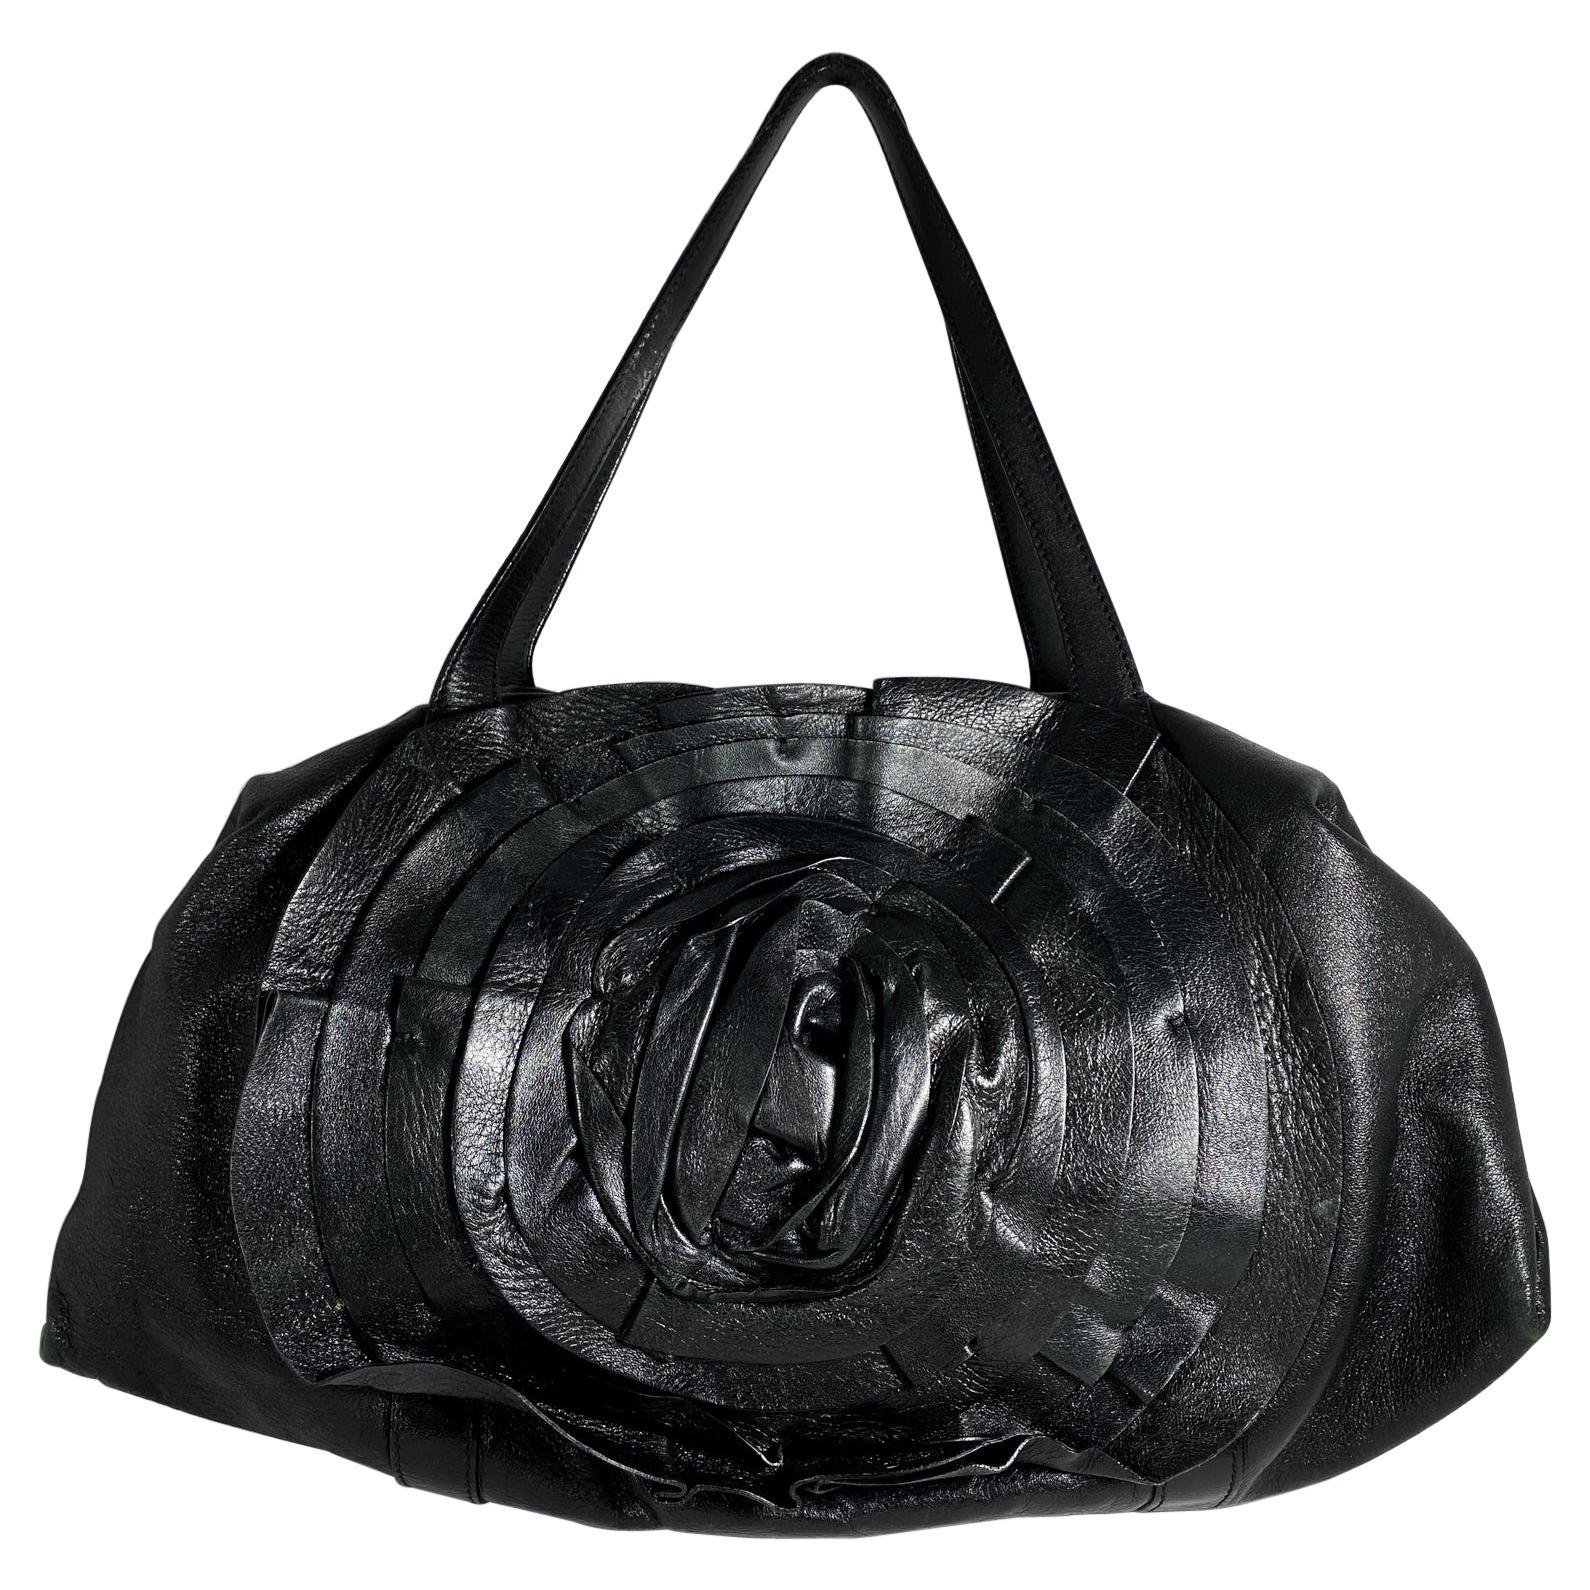 Valentino Black Leather Petale Bag